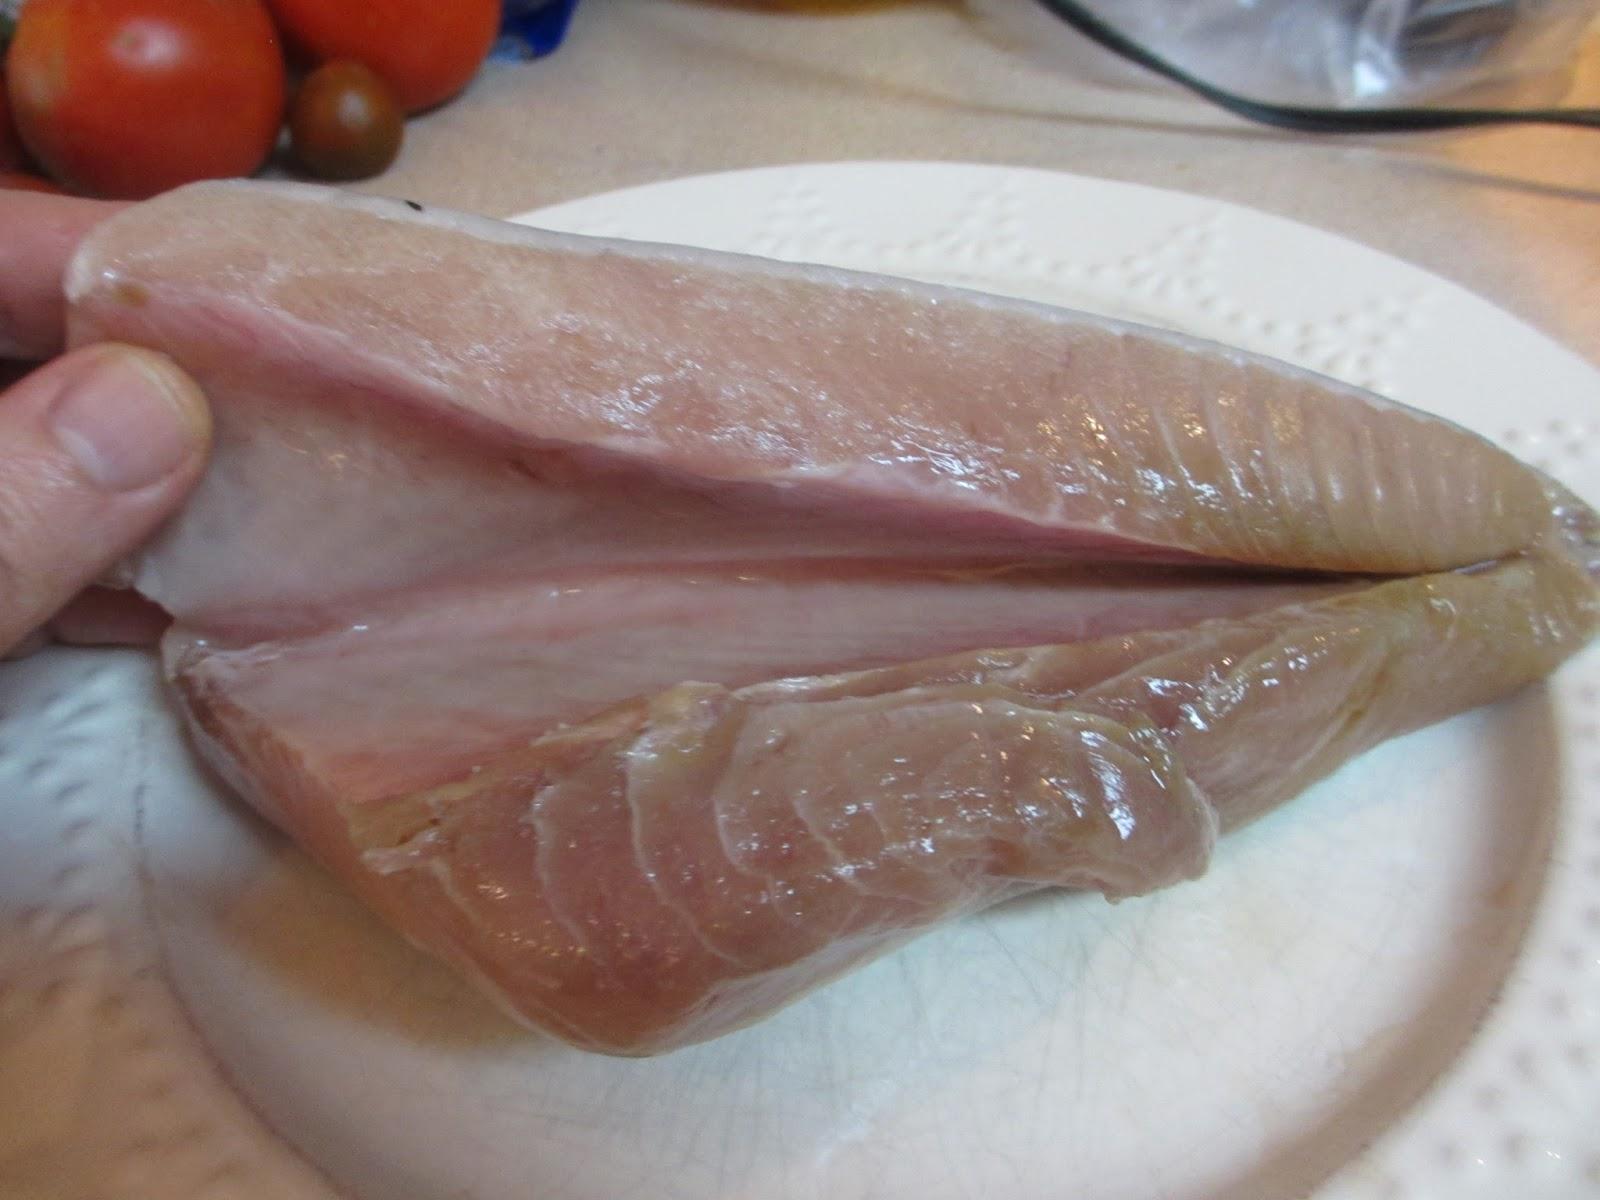 Cannundrums: Grilled Bluefin Fatty Tuna or Toro